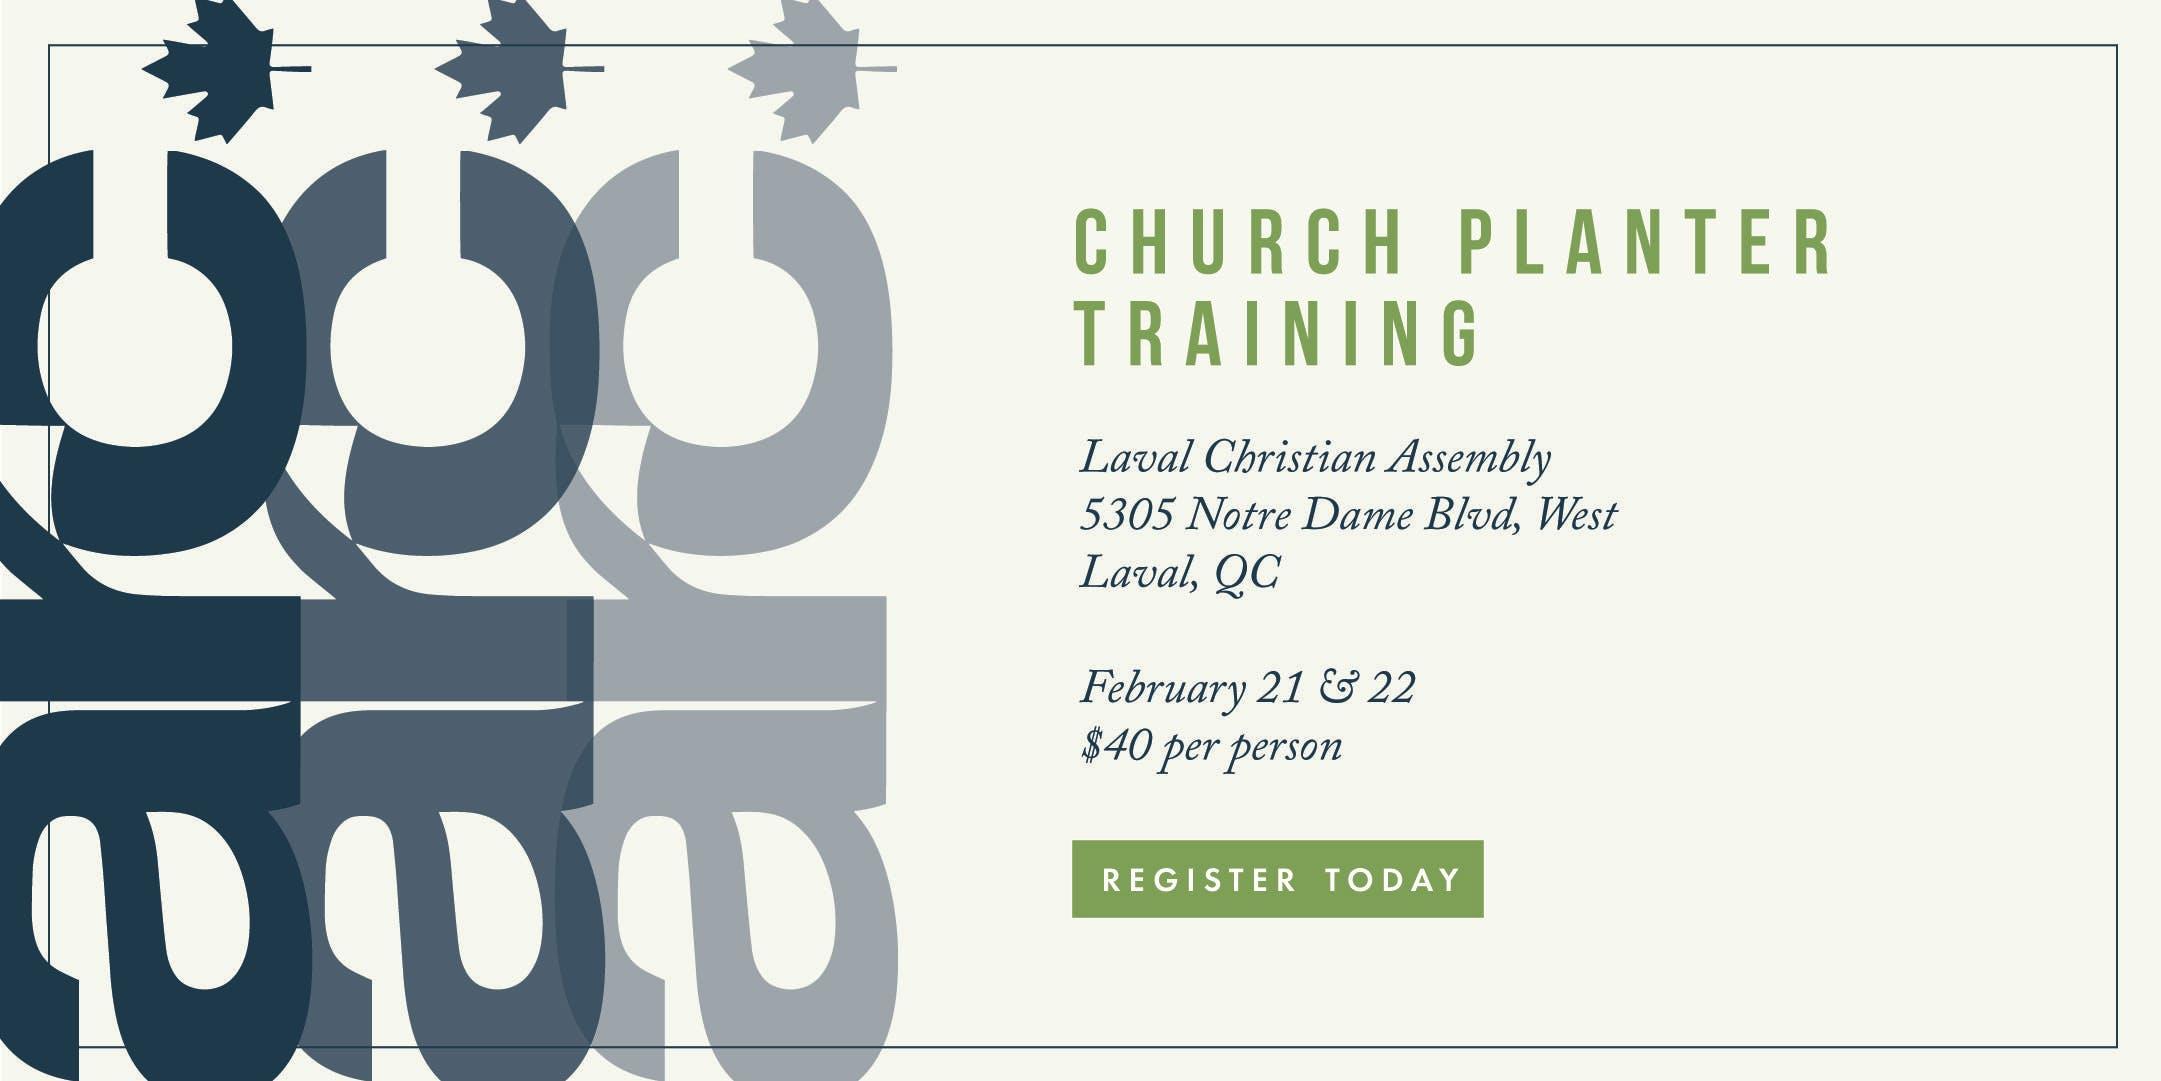 ARC Church Planter Training (bi-lingual)